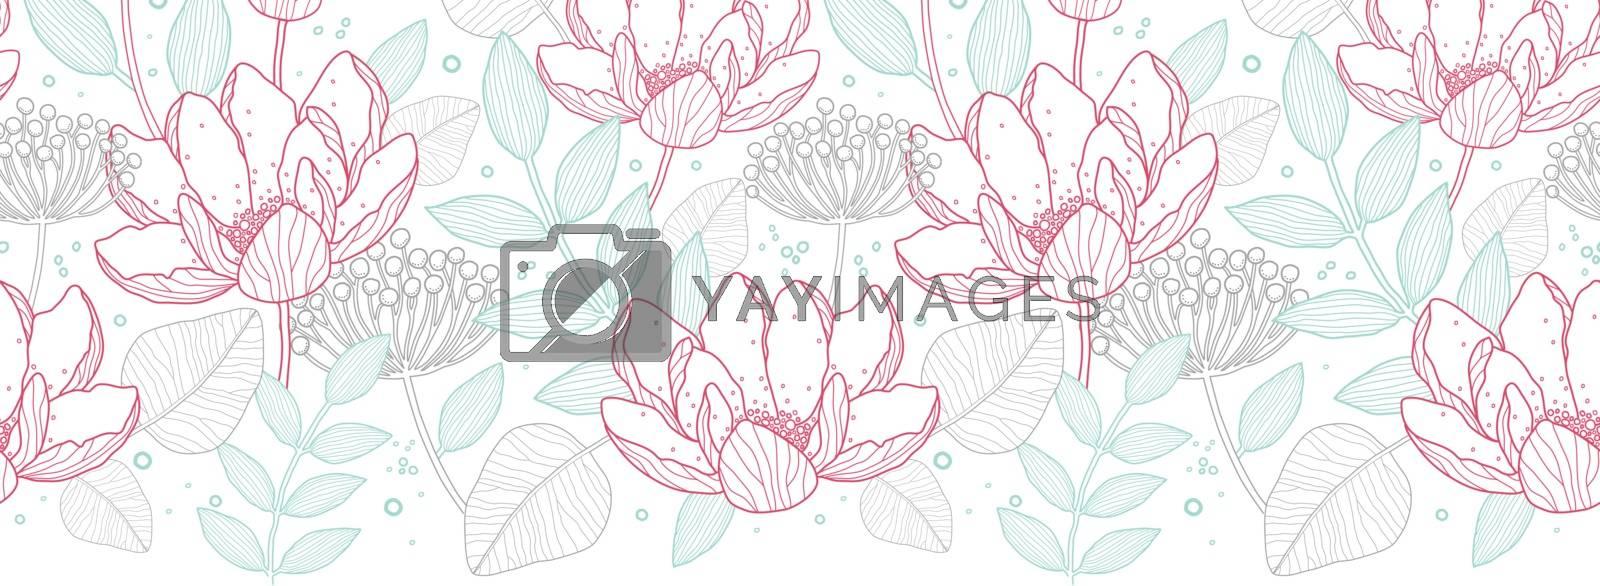 Vector modern line art florals horizontal border seamless pattern background graphic design